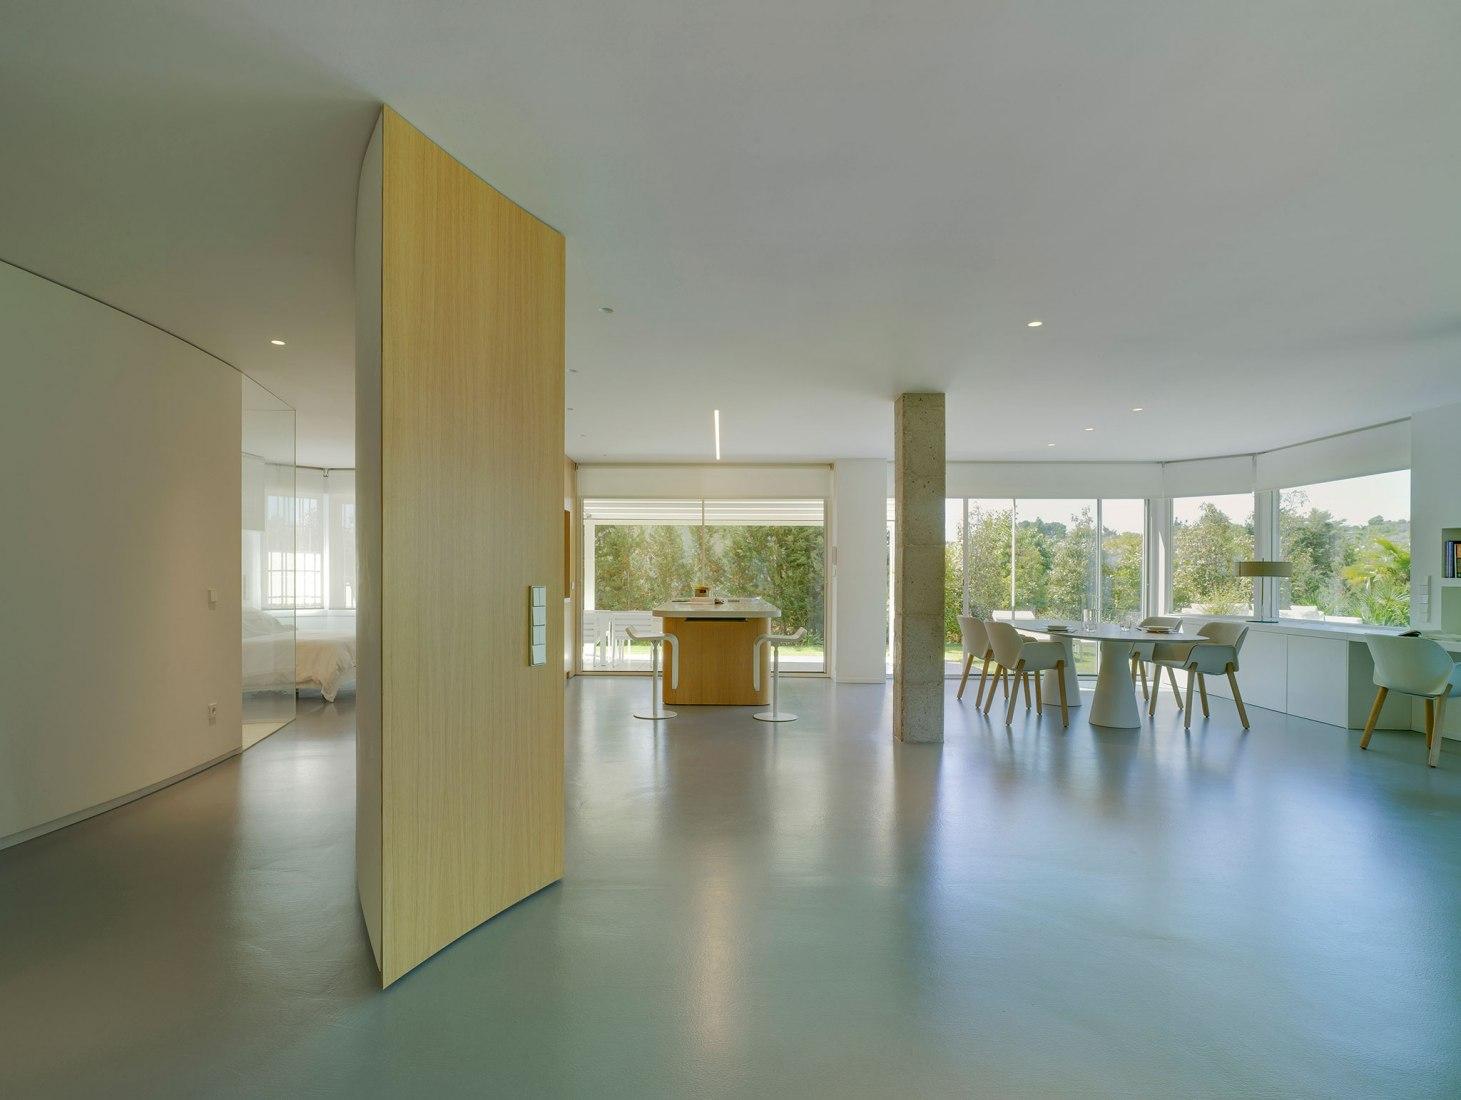 GW House Renovation by Jaime Sepulcre Arquitecturas. Photograph by David Frutos Ruiz